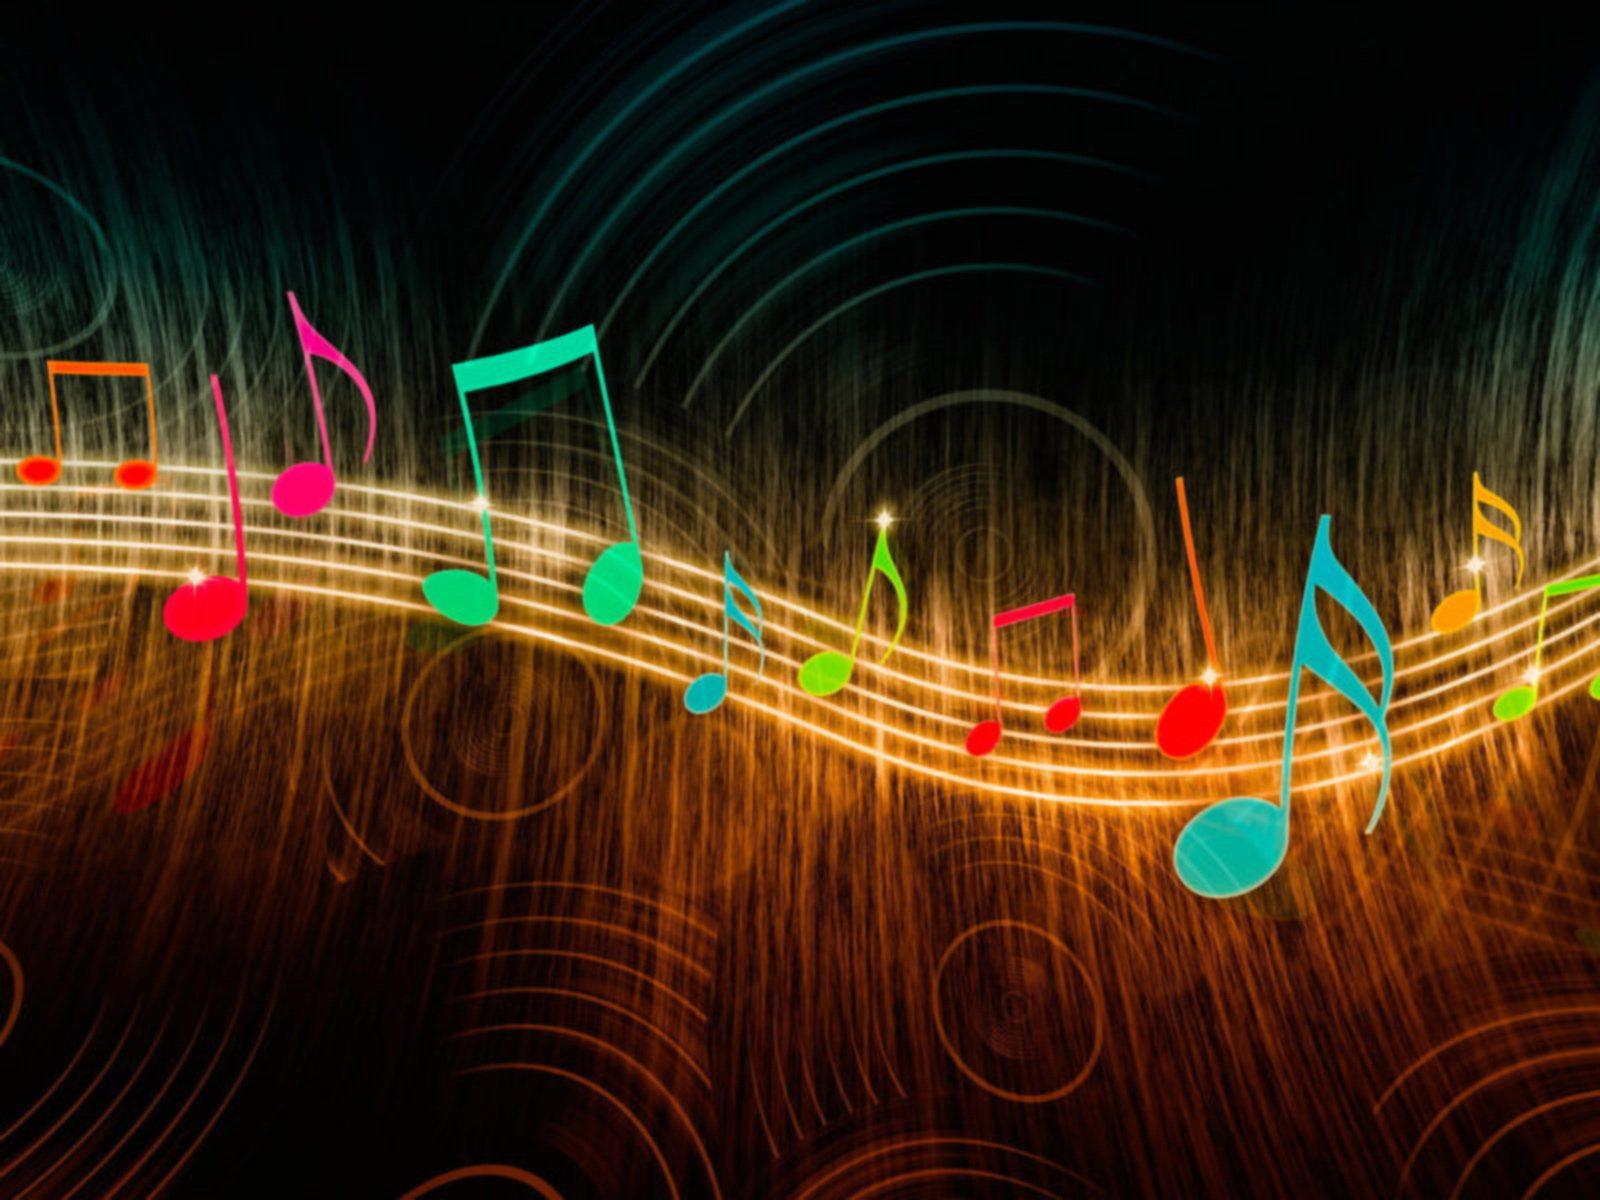 music-wallpaper-notes-1600x1200.jpg